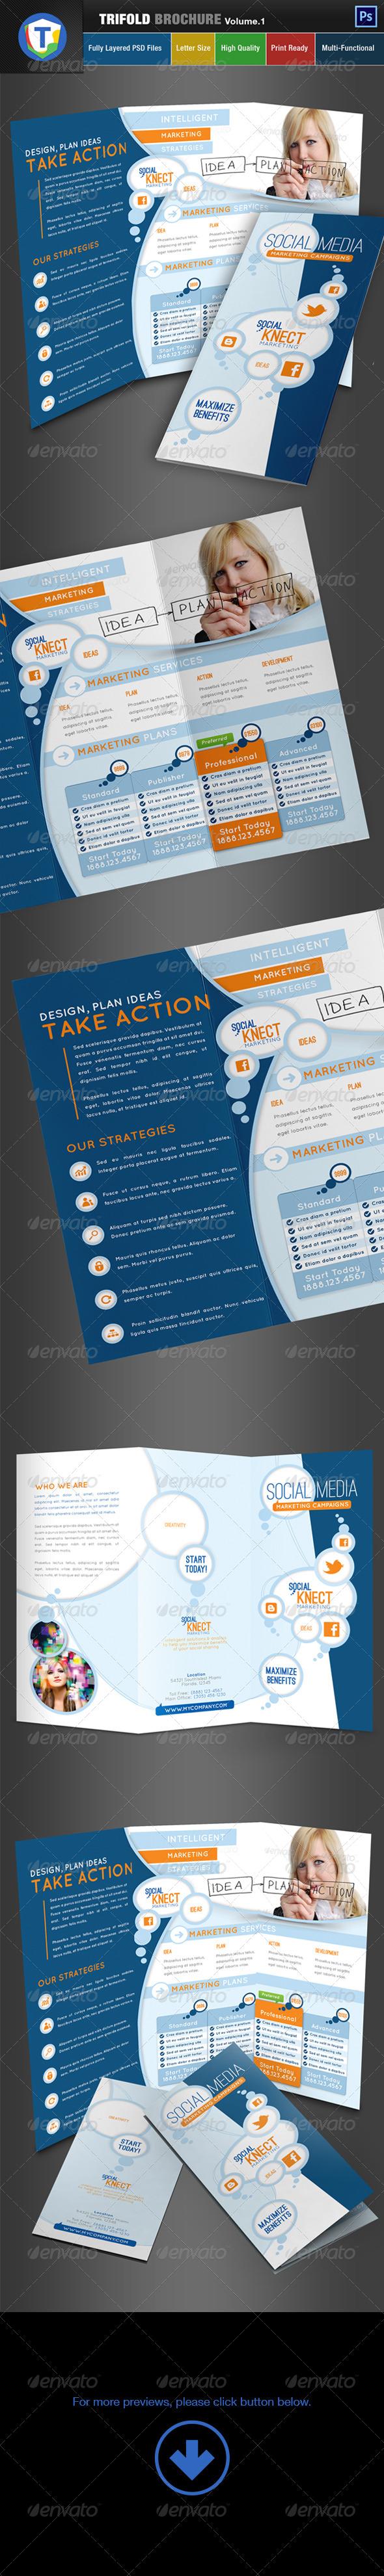 Social Media Trifold Brochure - Volume 1 - Brochures Print Templates